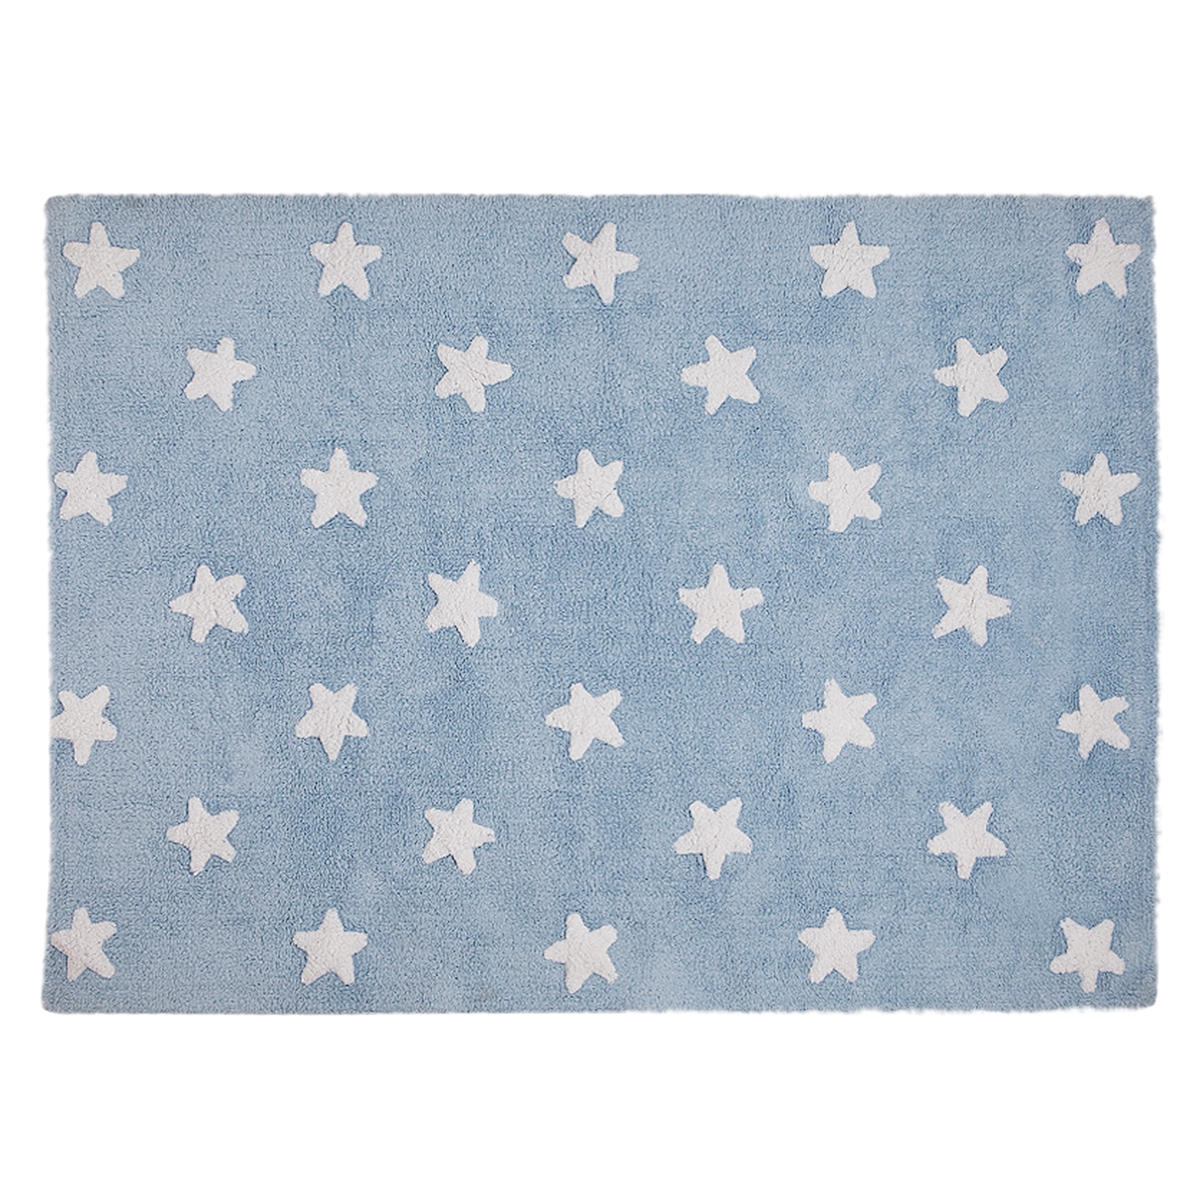 Lorena Canals Tapis Lavable Etoile - 120 x 160 cm - Bleu/Blanc ...